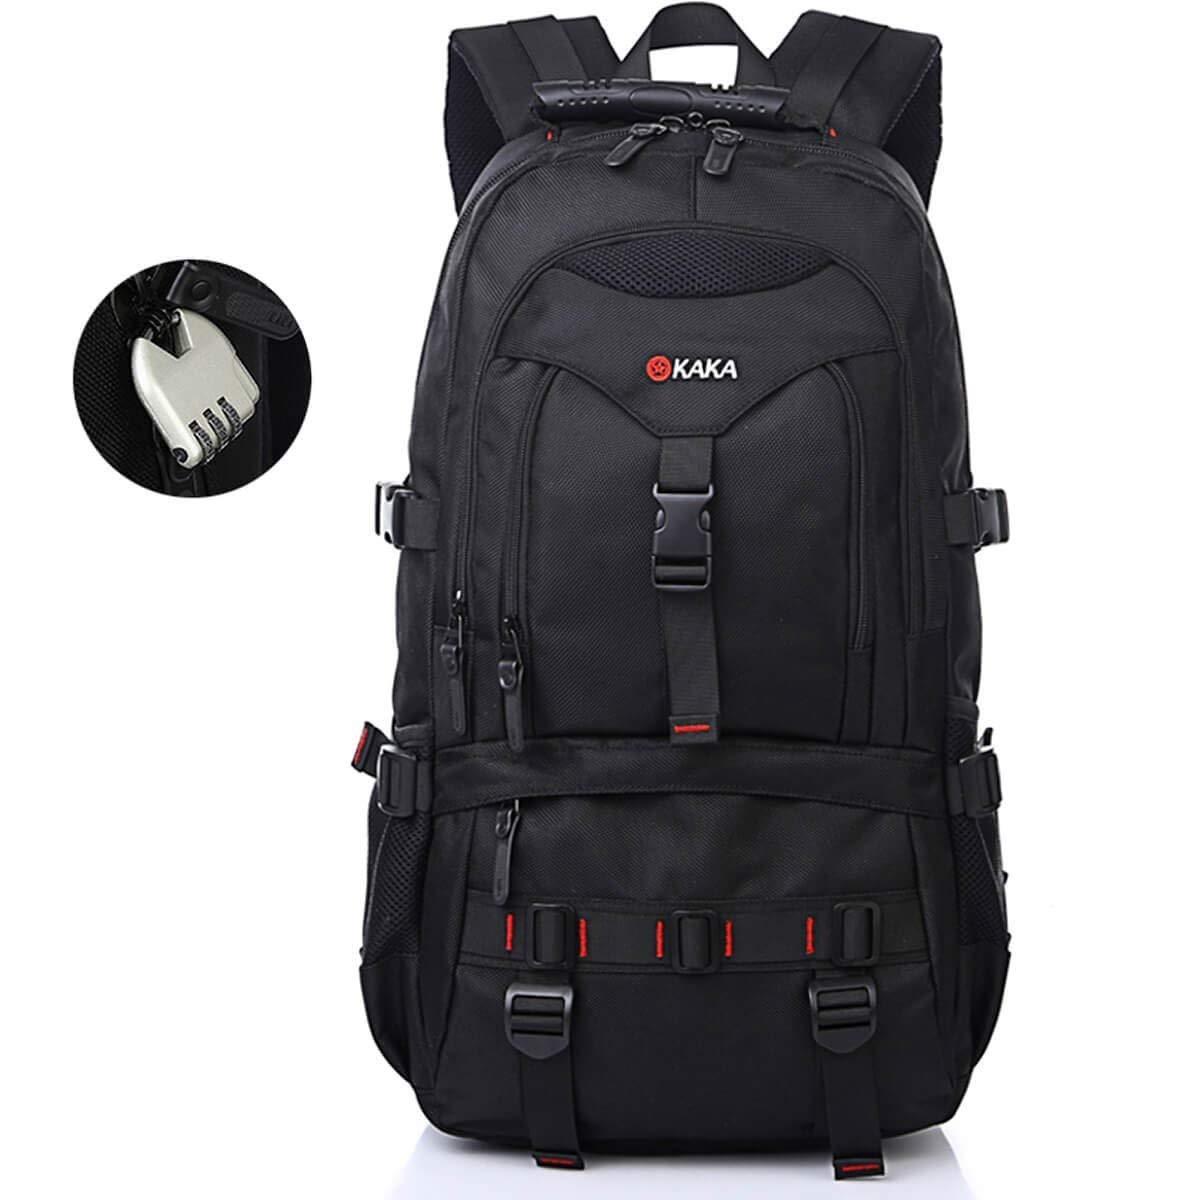 Туристический рюкзак Kaka 2020 для путешествий и туризма, 40л